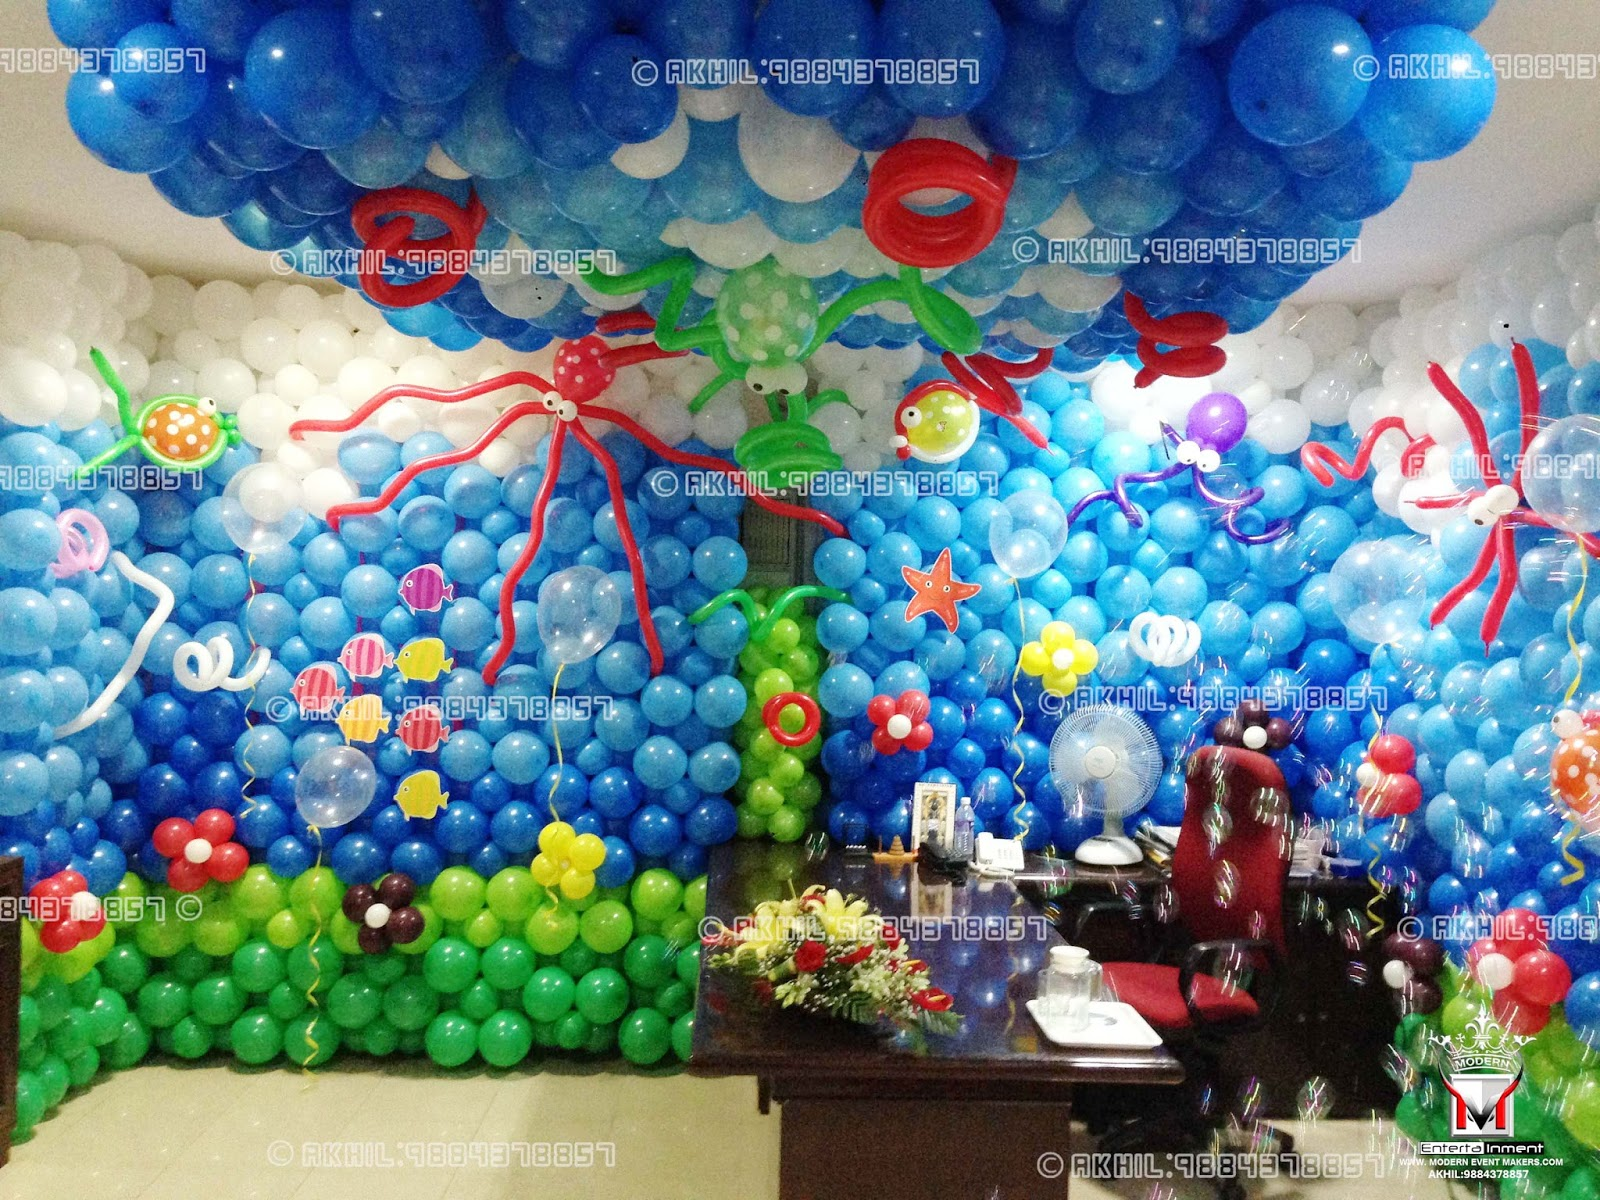 Balloon Party Decorators Balloon Decorations Birthday Party